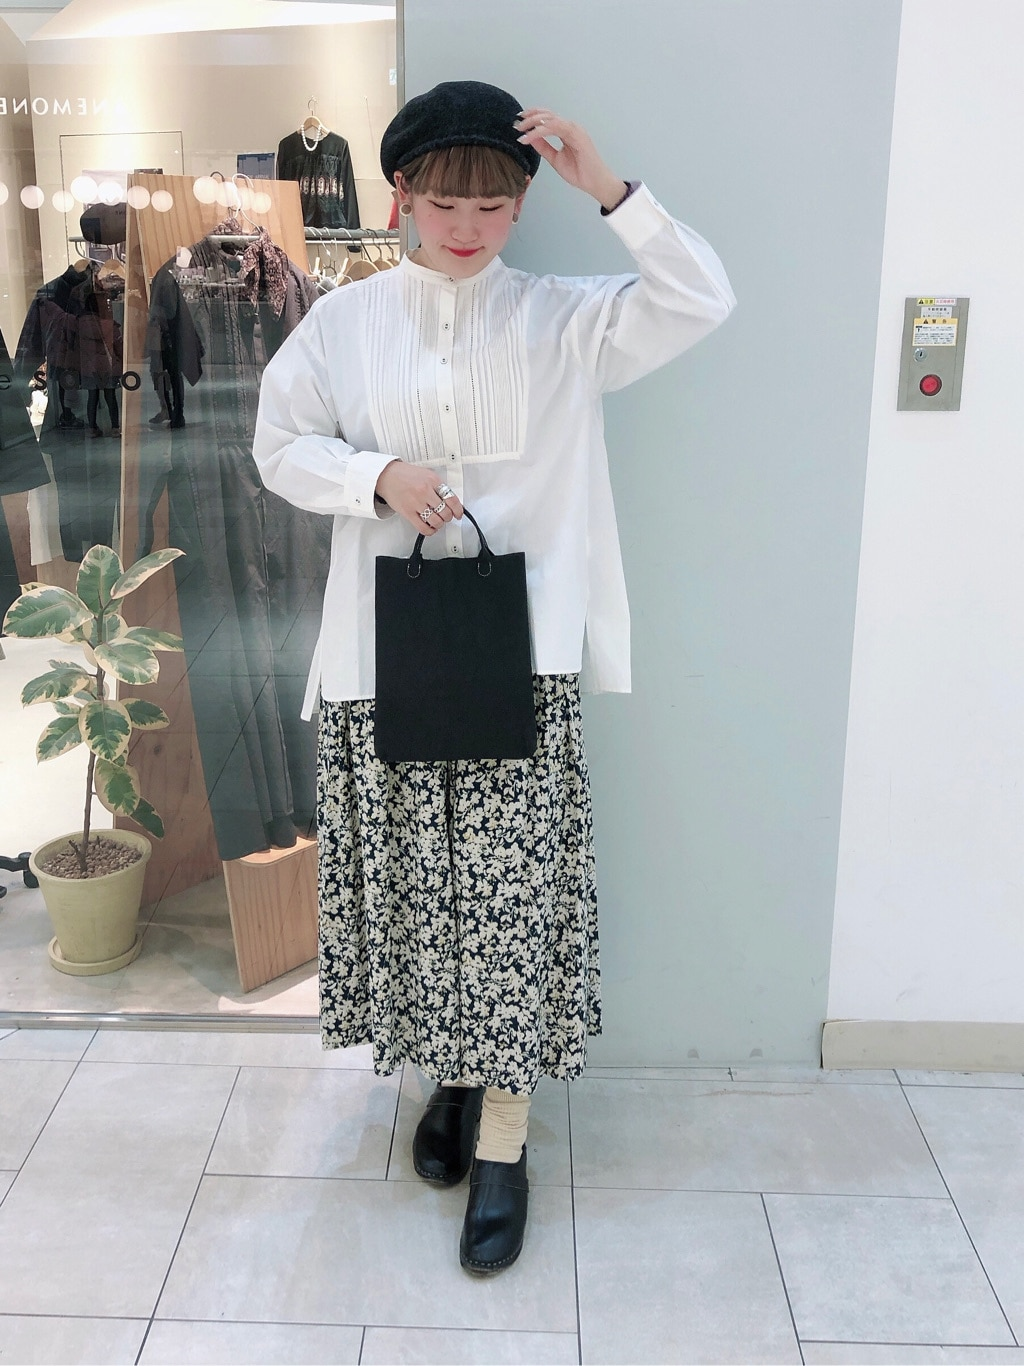 bulle de savon 阪急西宮ガーデンズ 身長:166cm 2019.12.18